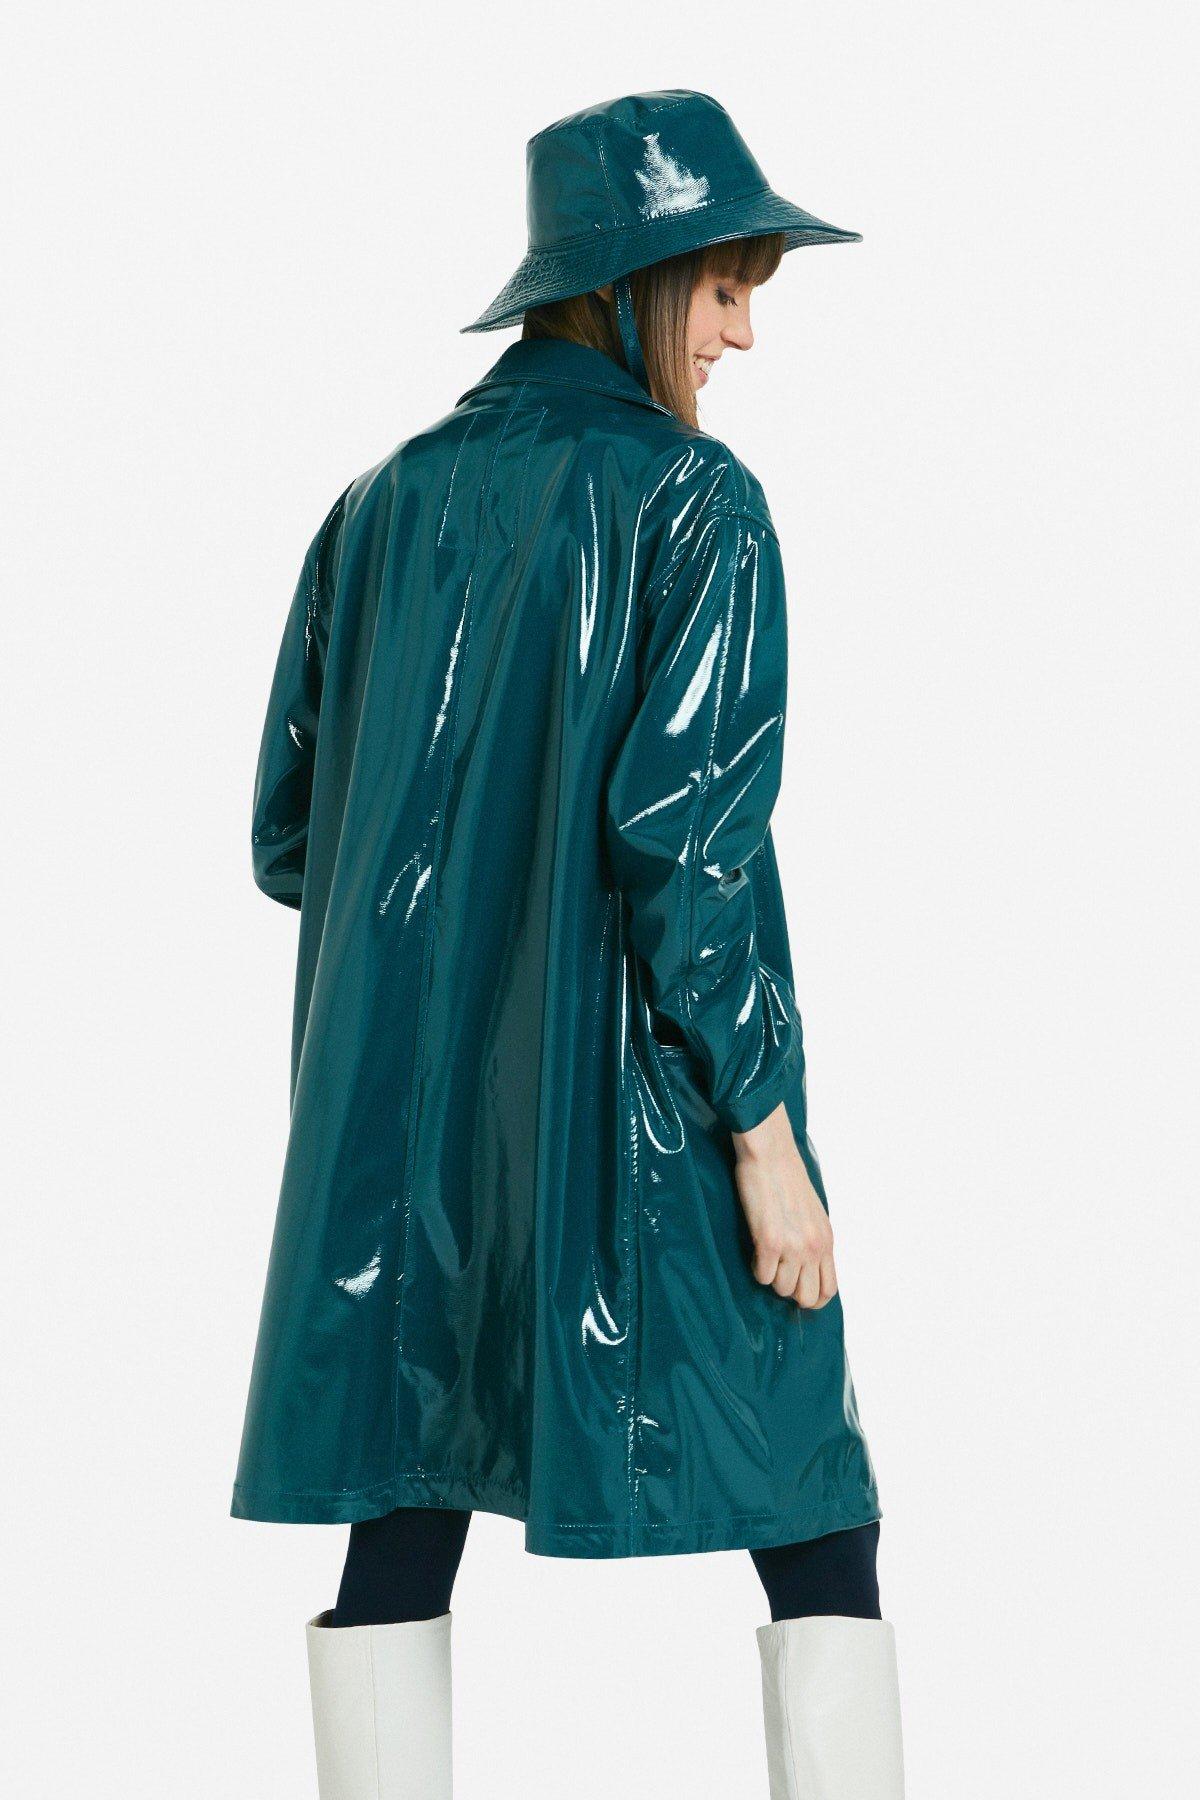 Patent leather raincoat